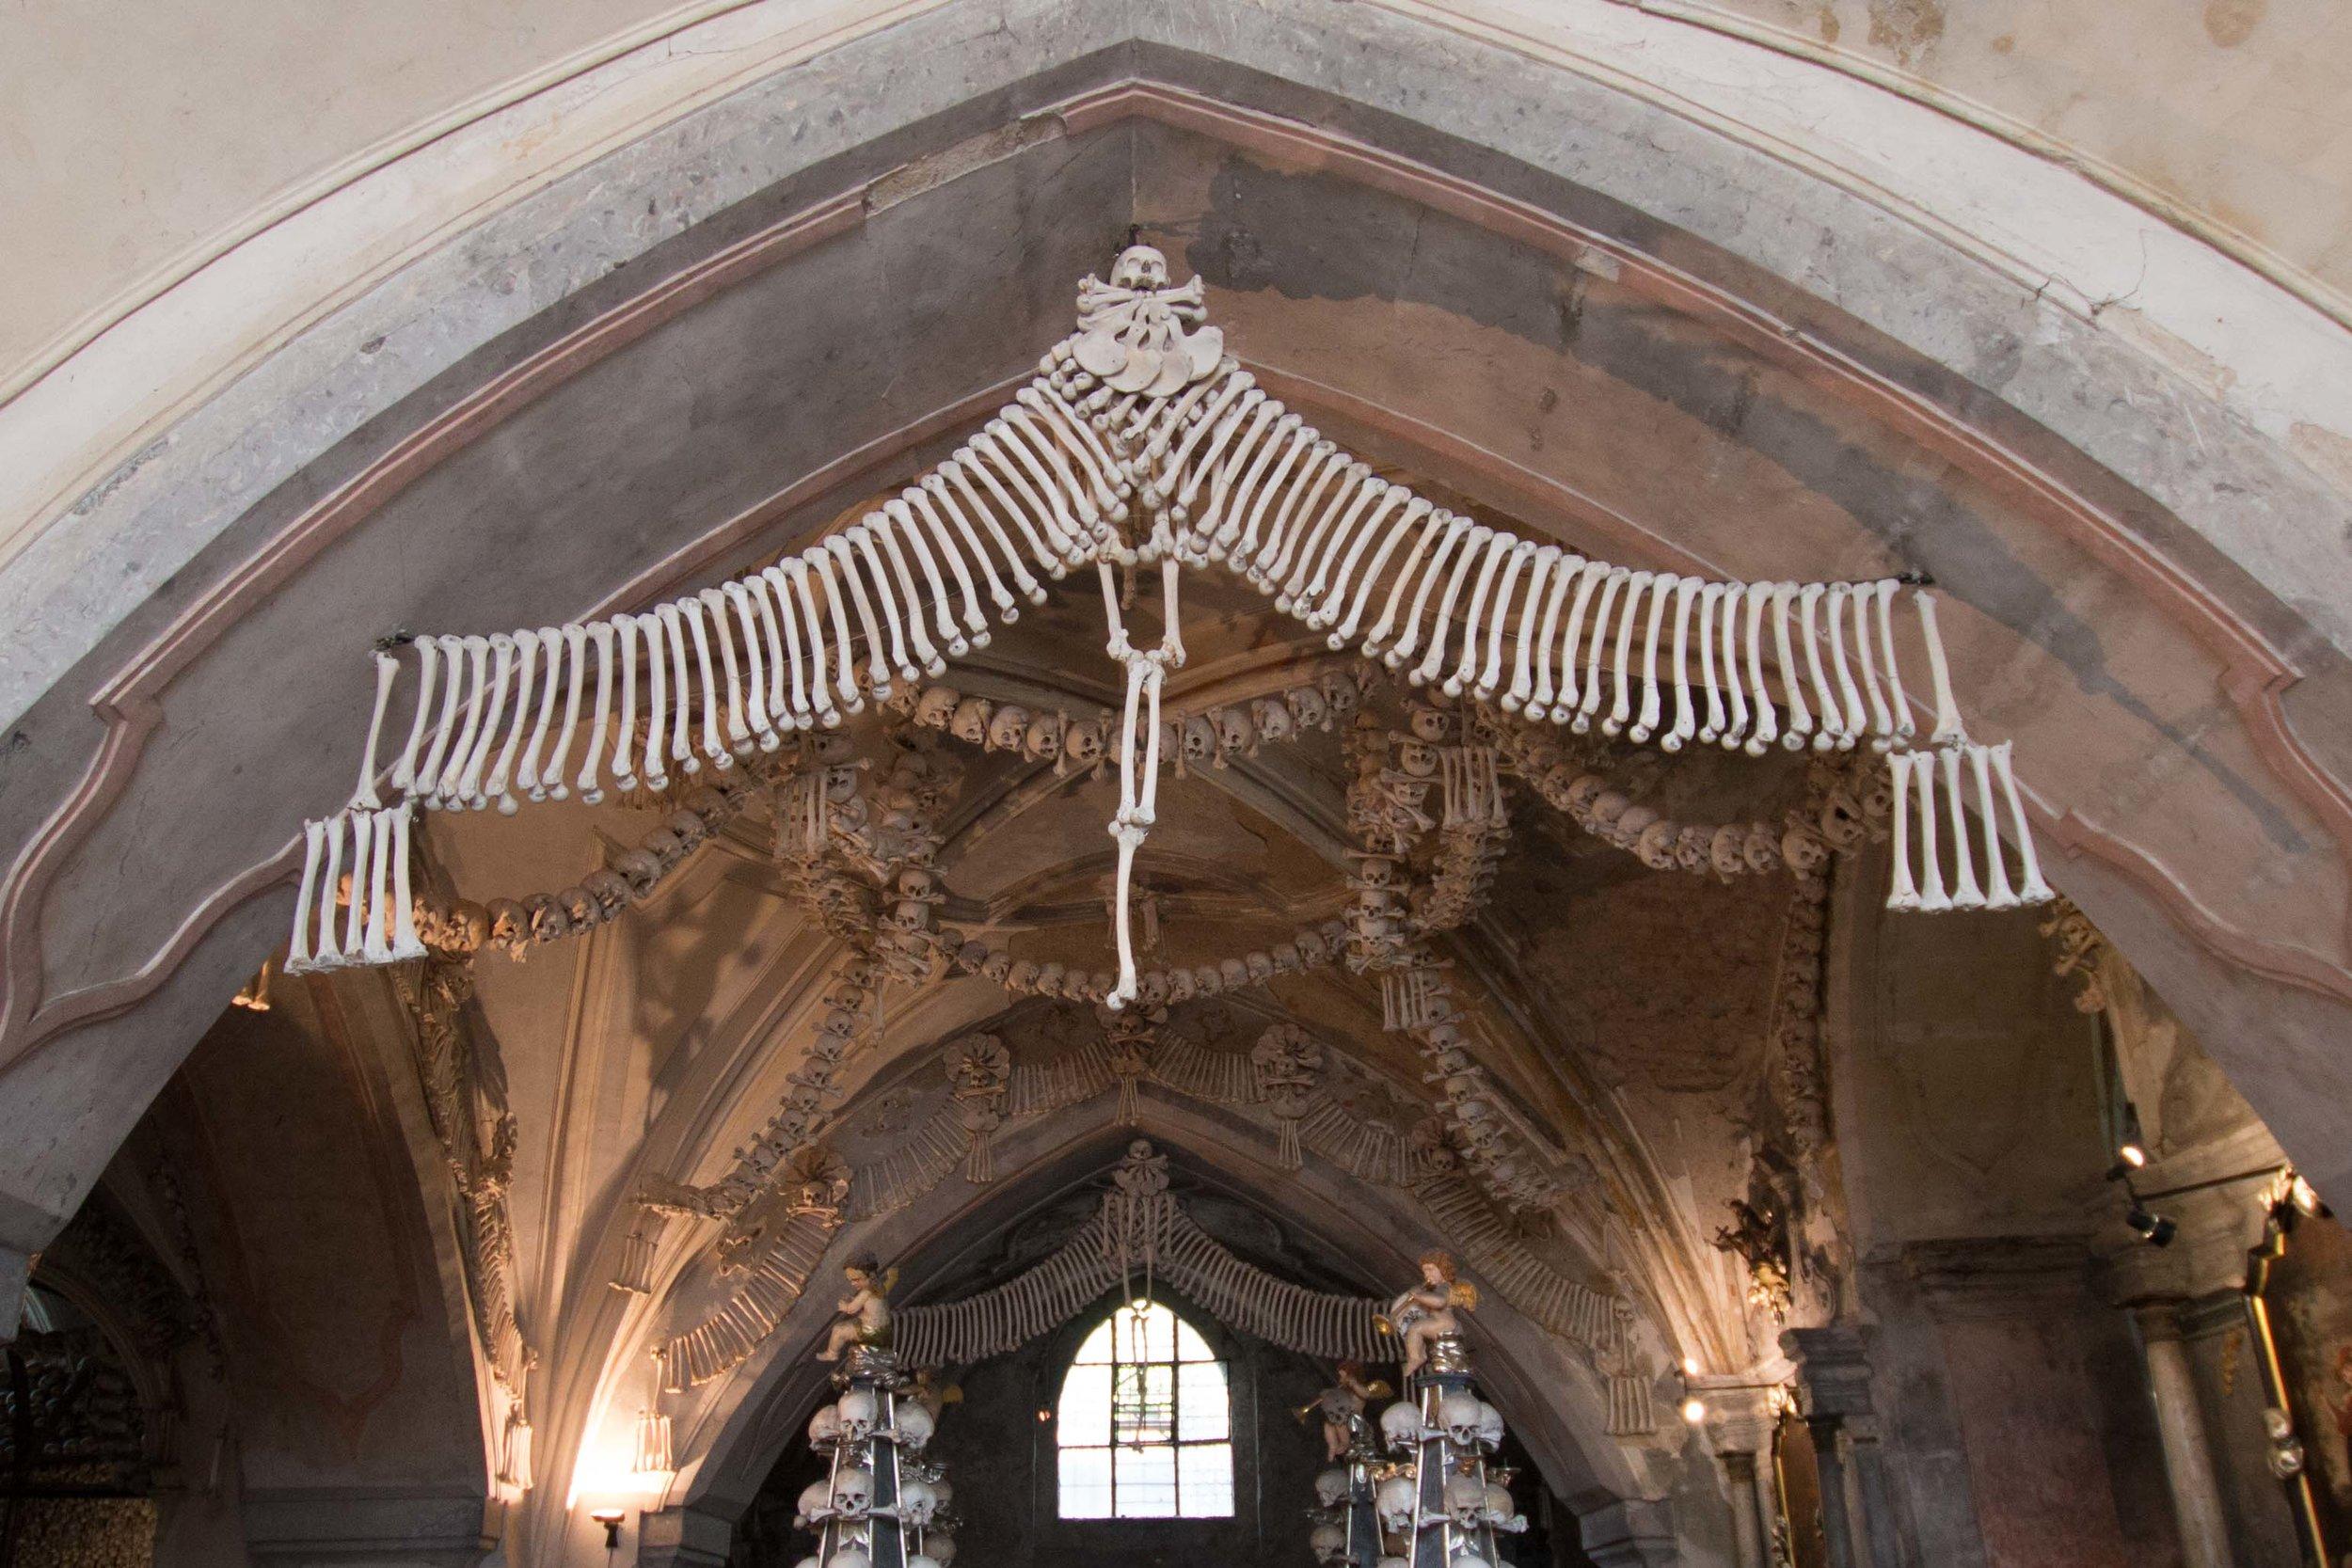 A garland of long bones hangs above the entrance